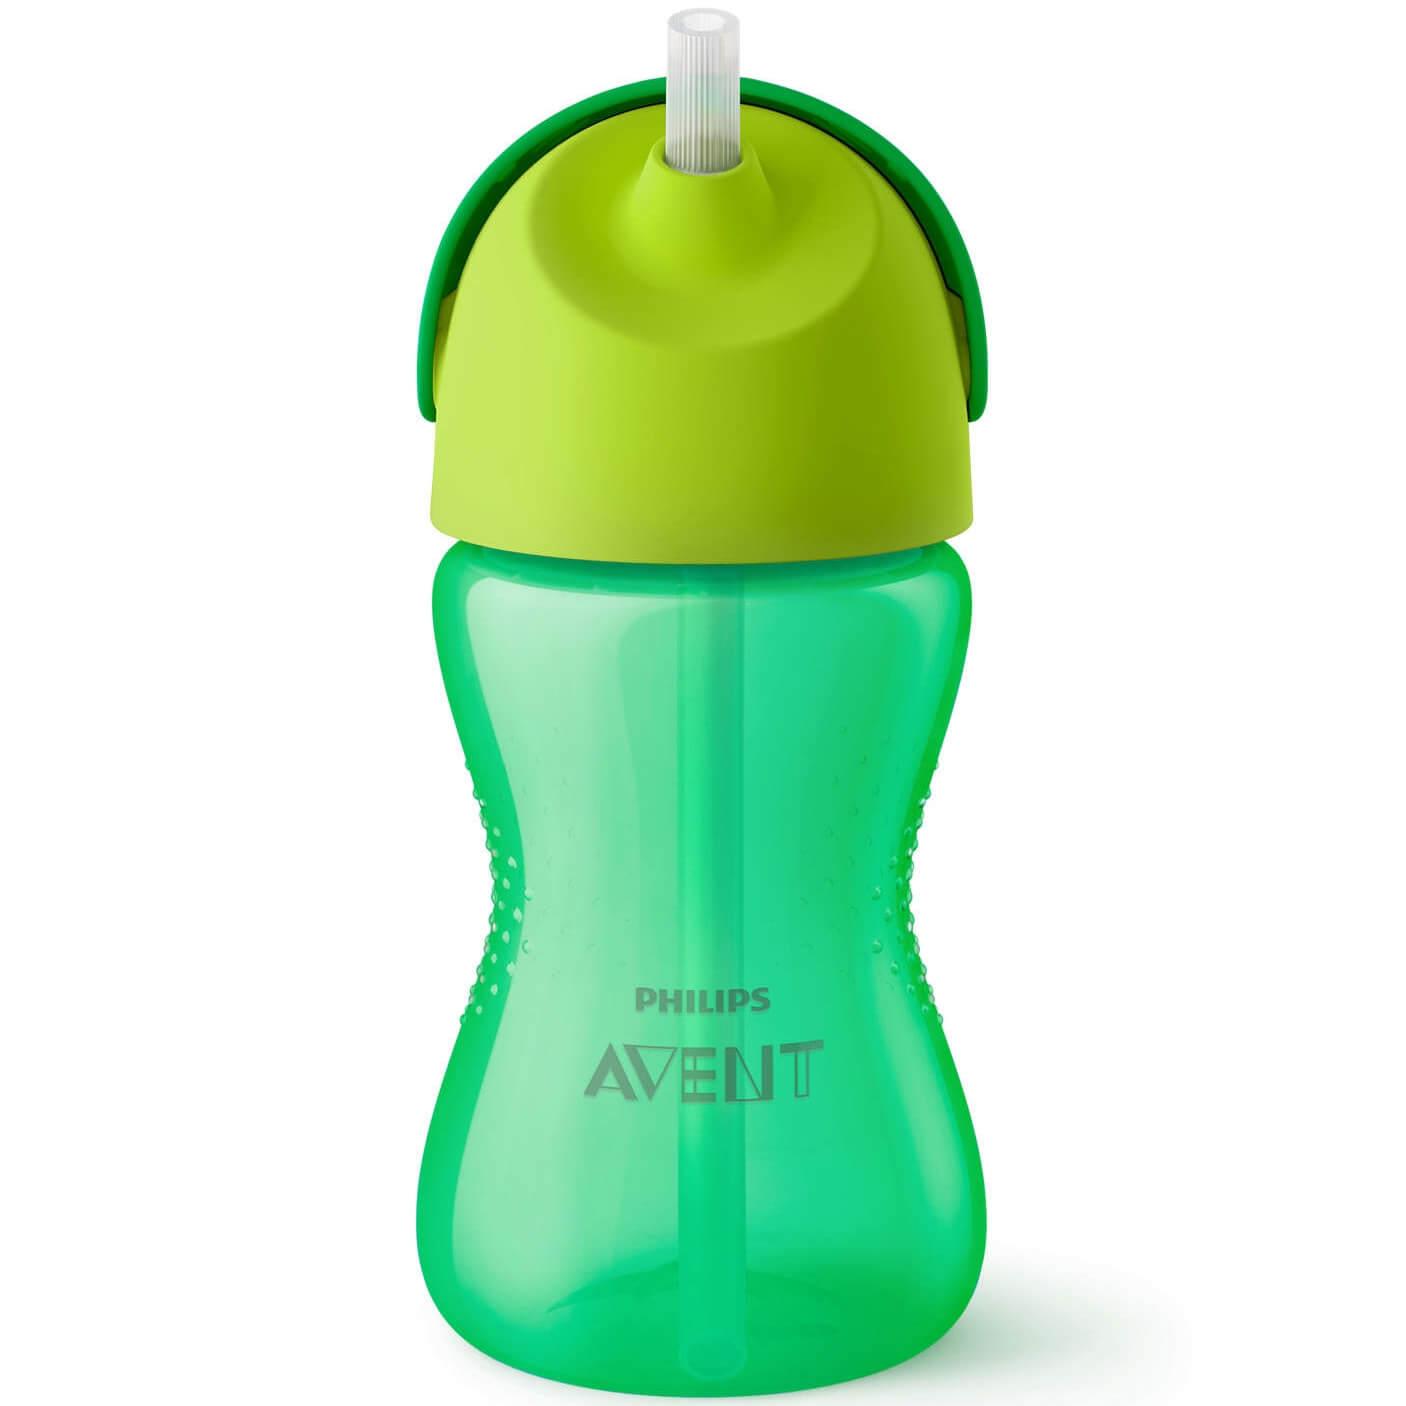 Philips Avent Bendy Straw Cup Κύπελλο με Καλαμάκι 12m+ 300ml SCF798/01-02 – πράσινο